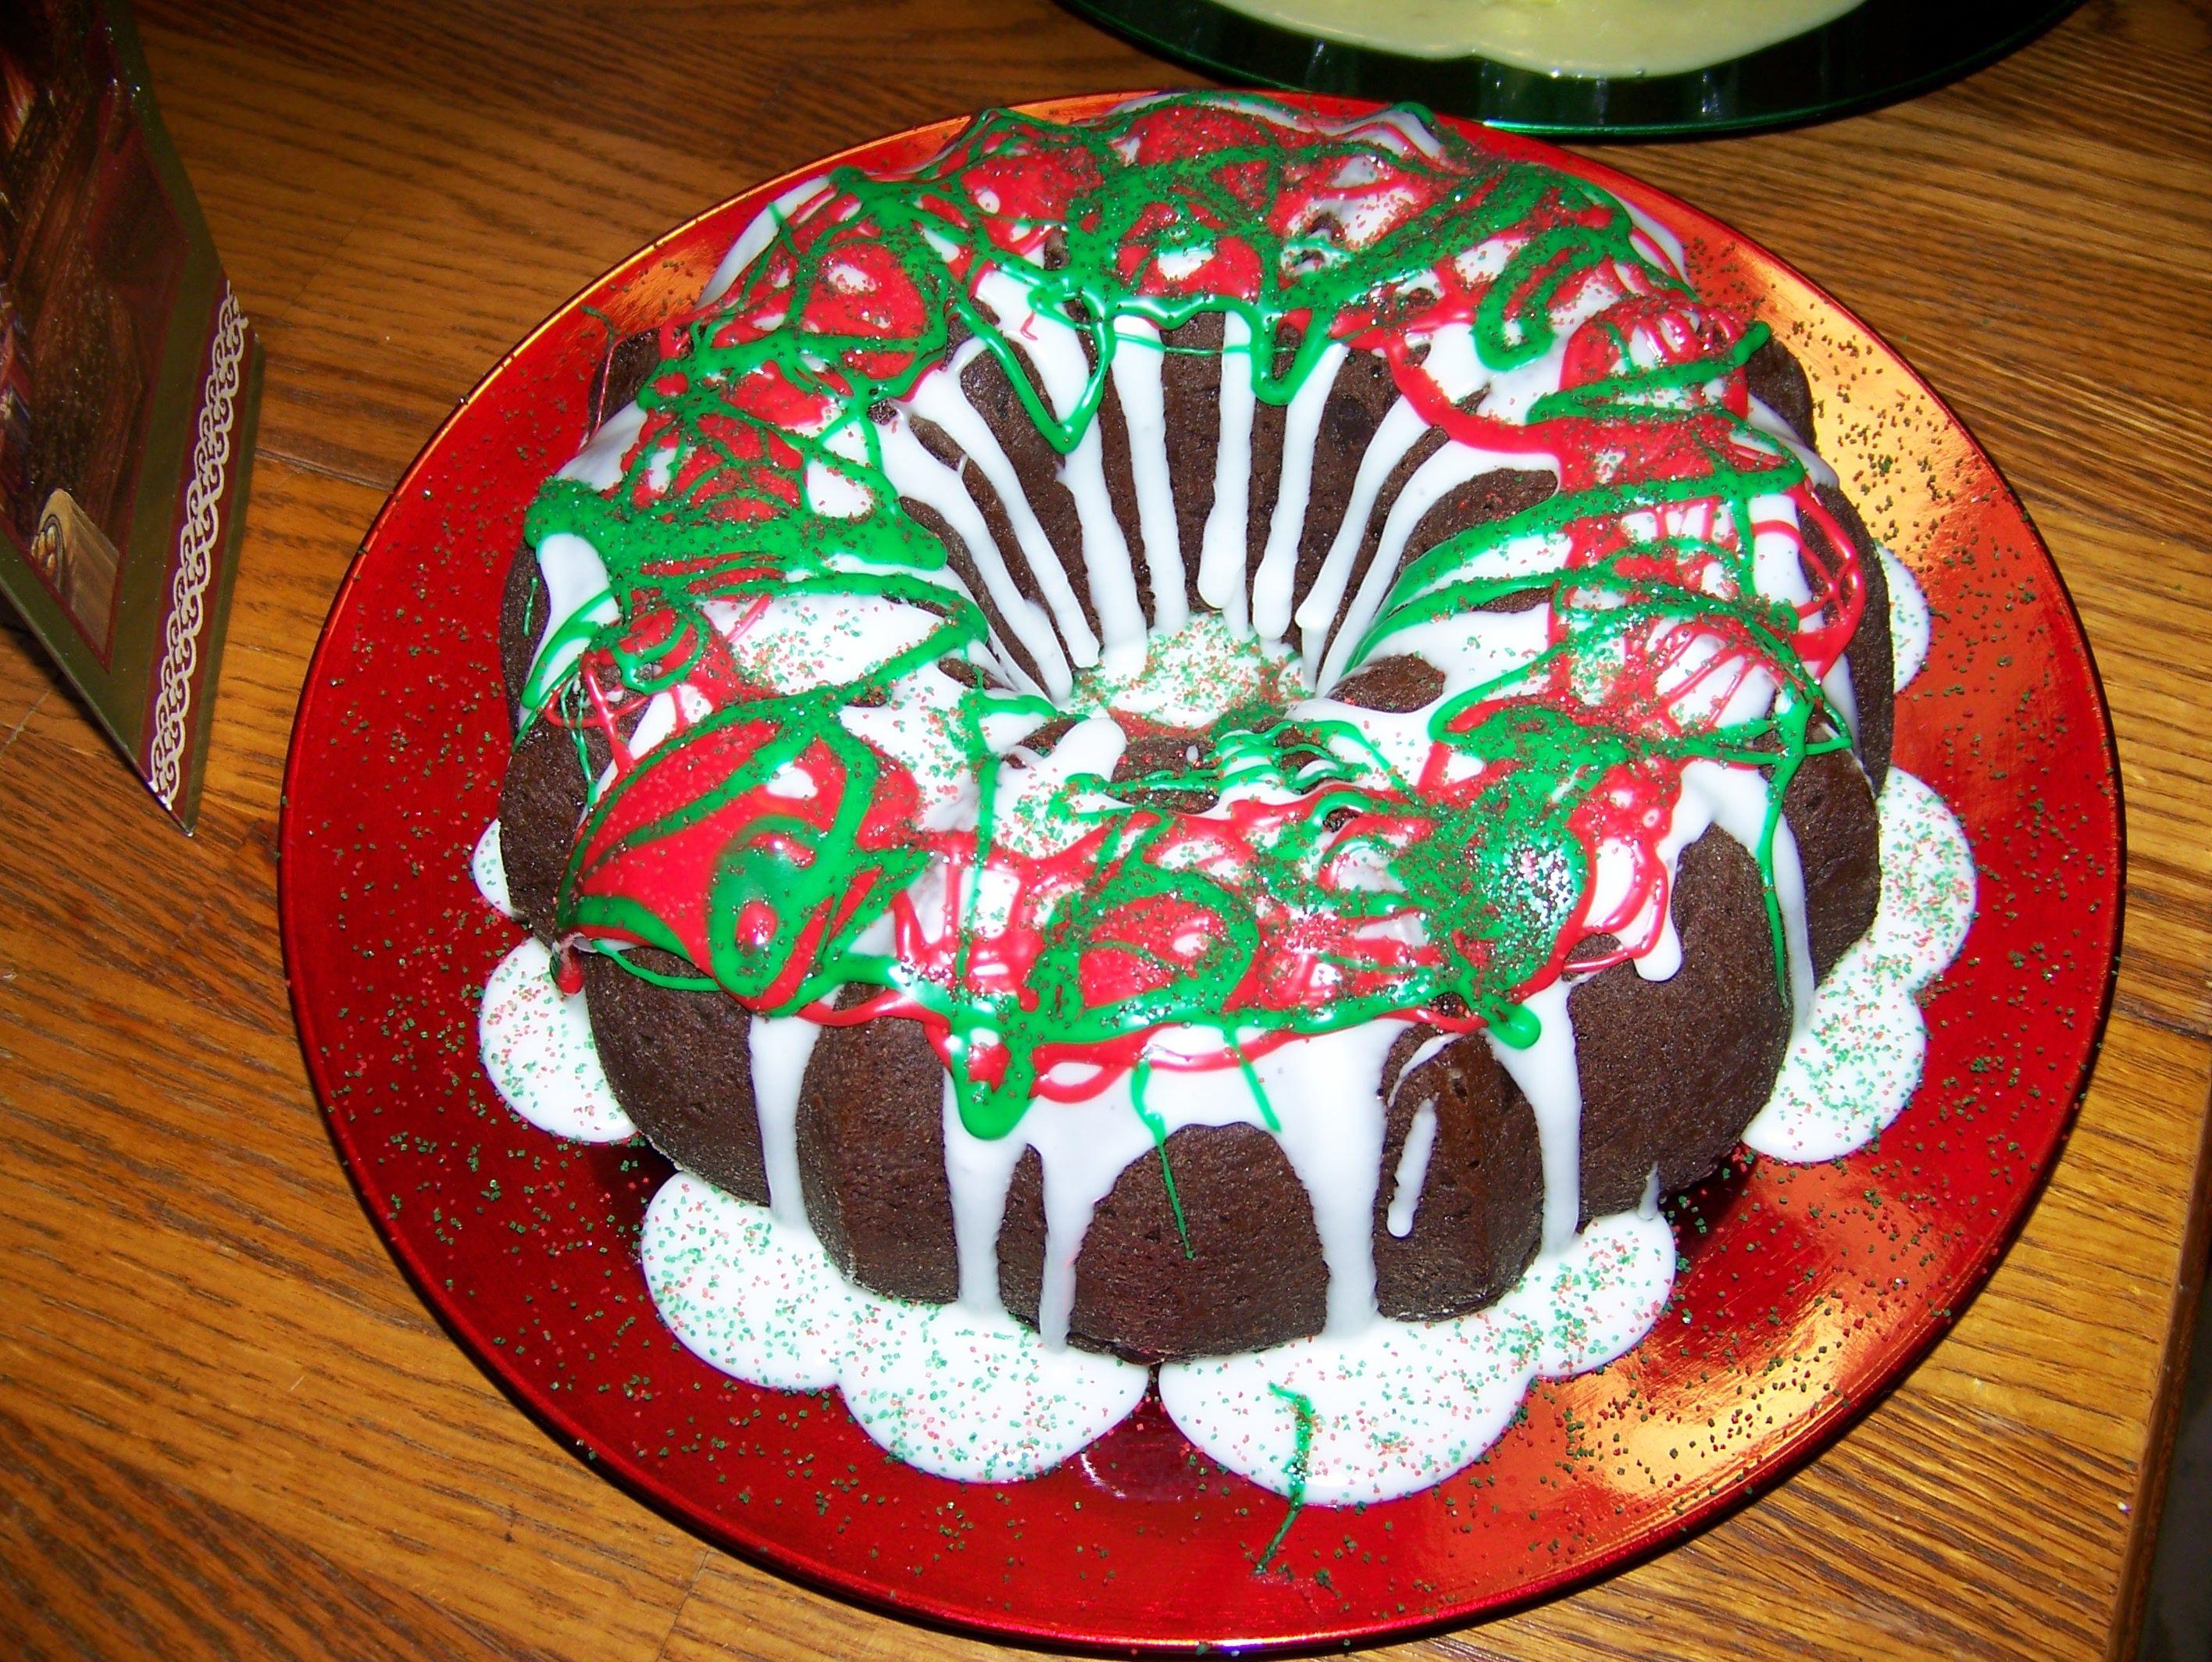 Christmas Bundt Cake Images : Christmas Bundt Cake Bake Sale Pinterest